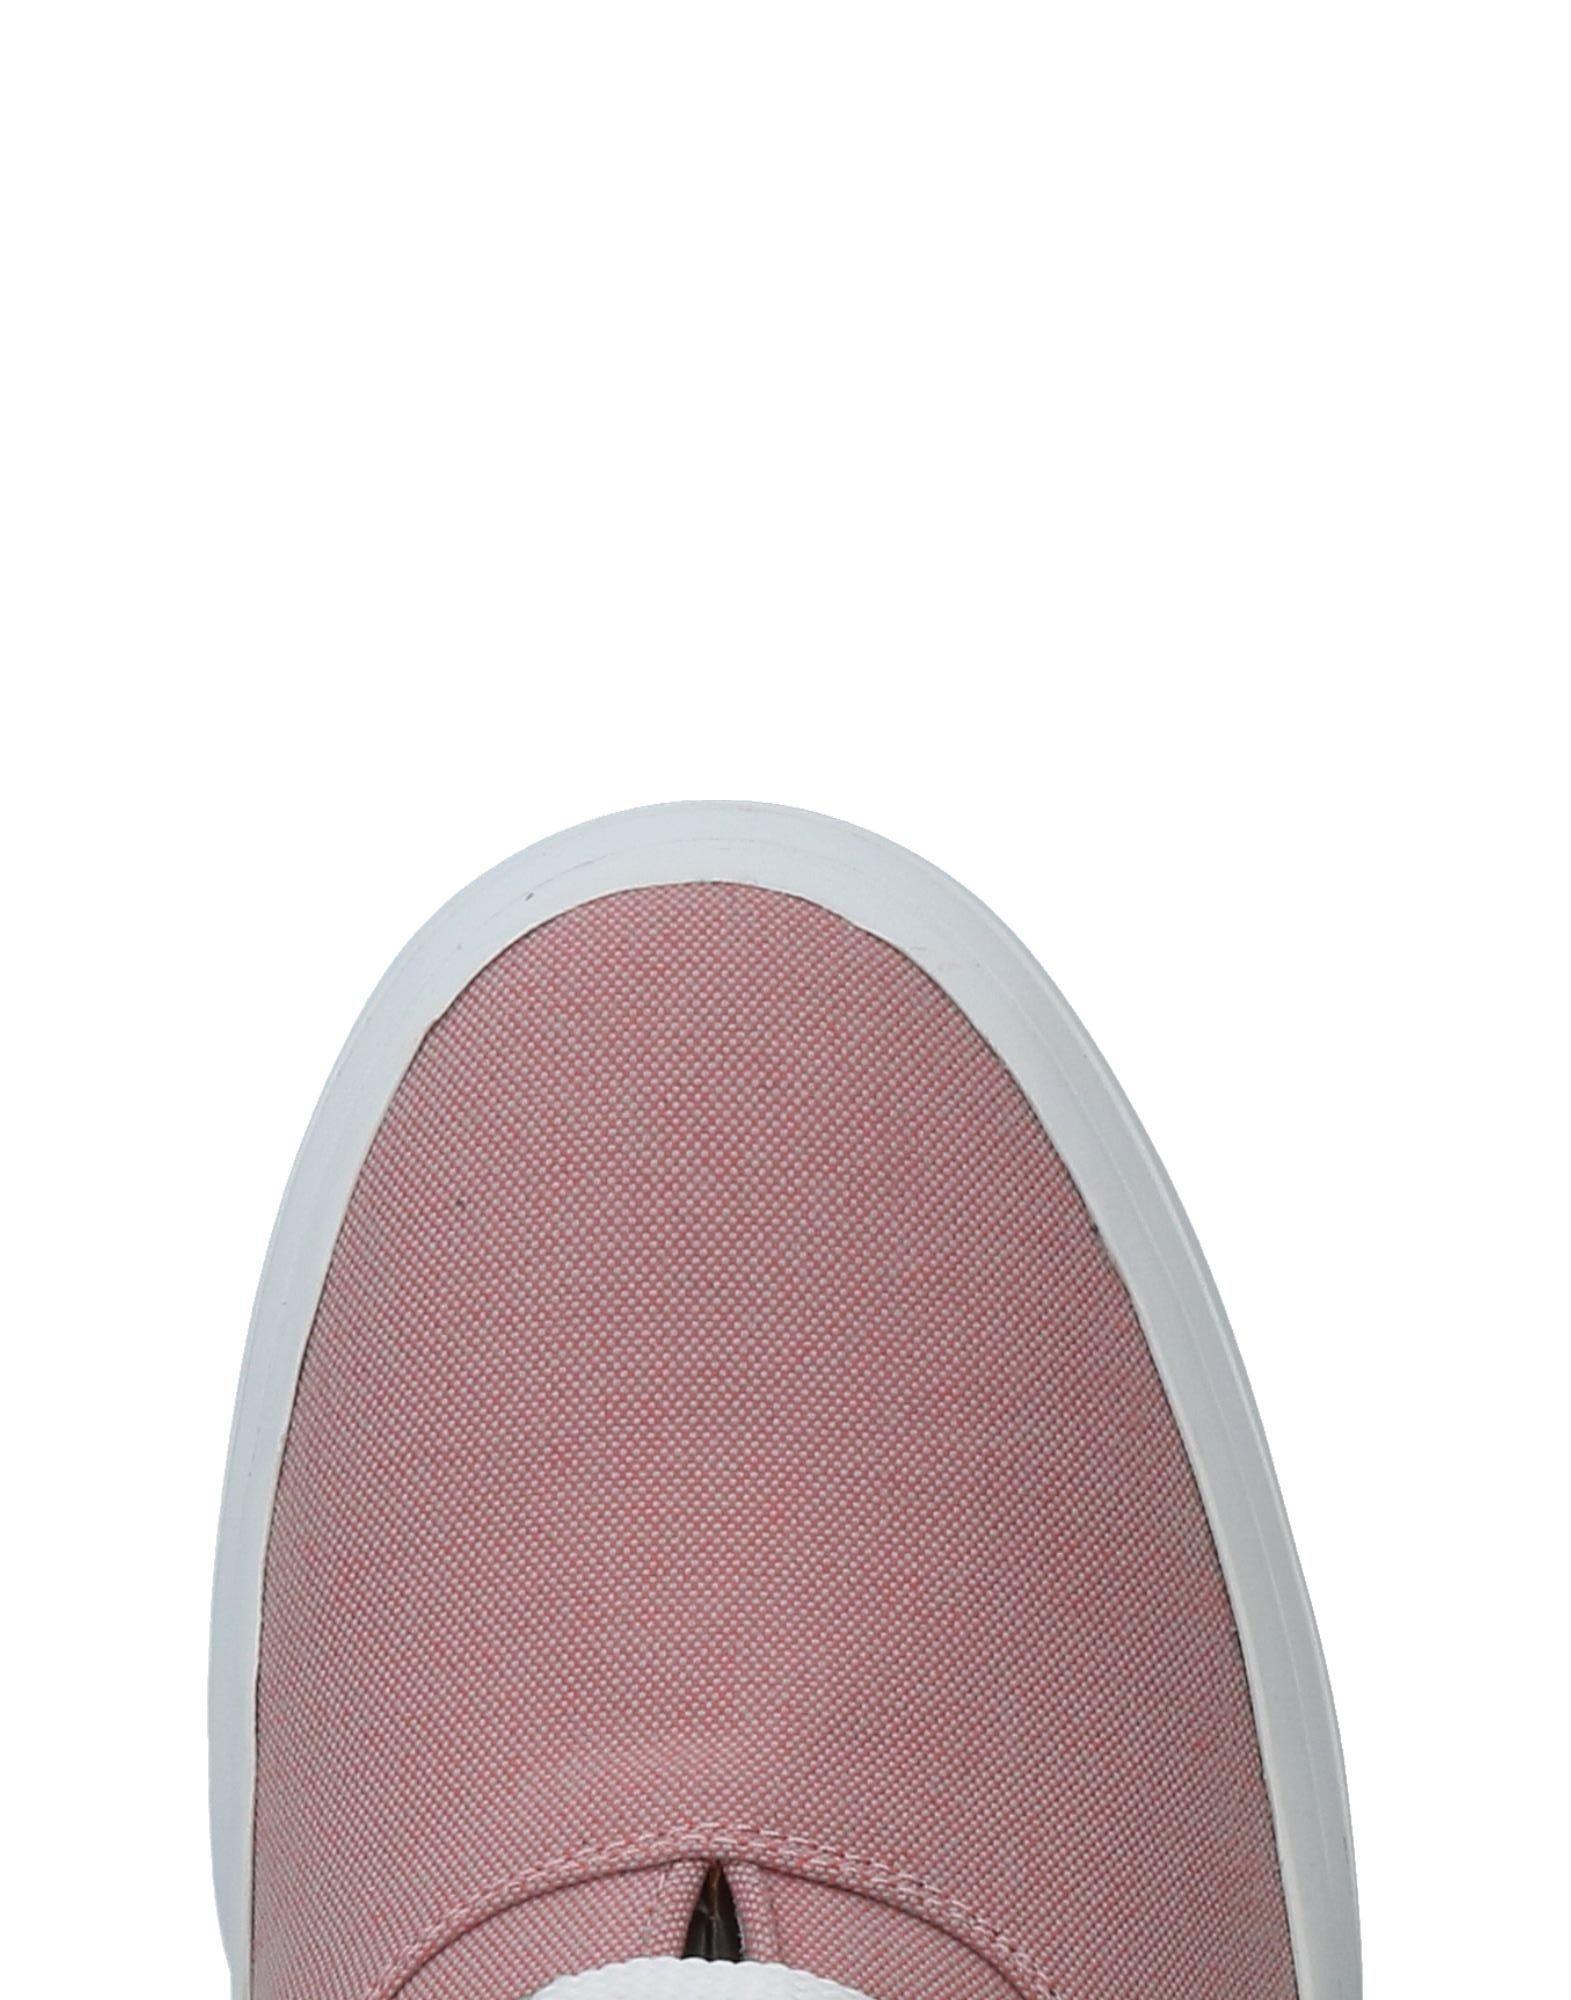 Sneakers Oamc Homme - Sneakers Oamc sur